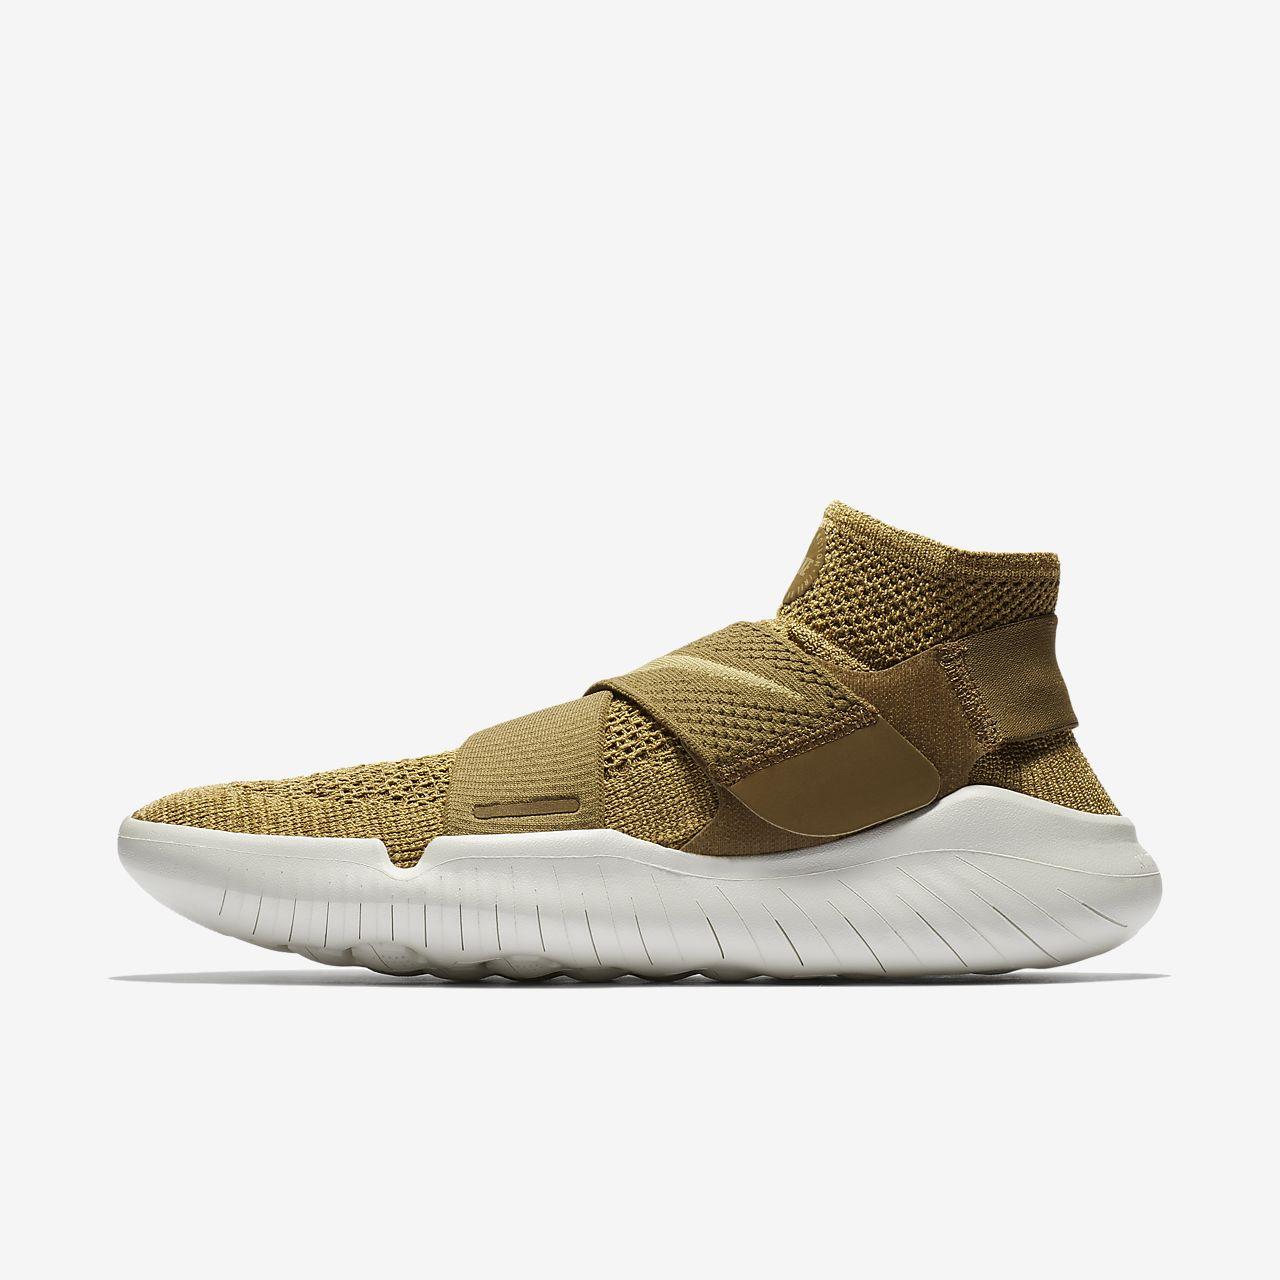 c35932fd1902 Nike Free RN Motion Flyknit 2018 Men s Running Shoe. Nike.com